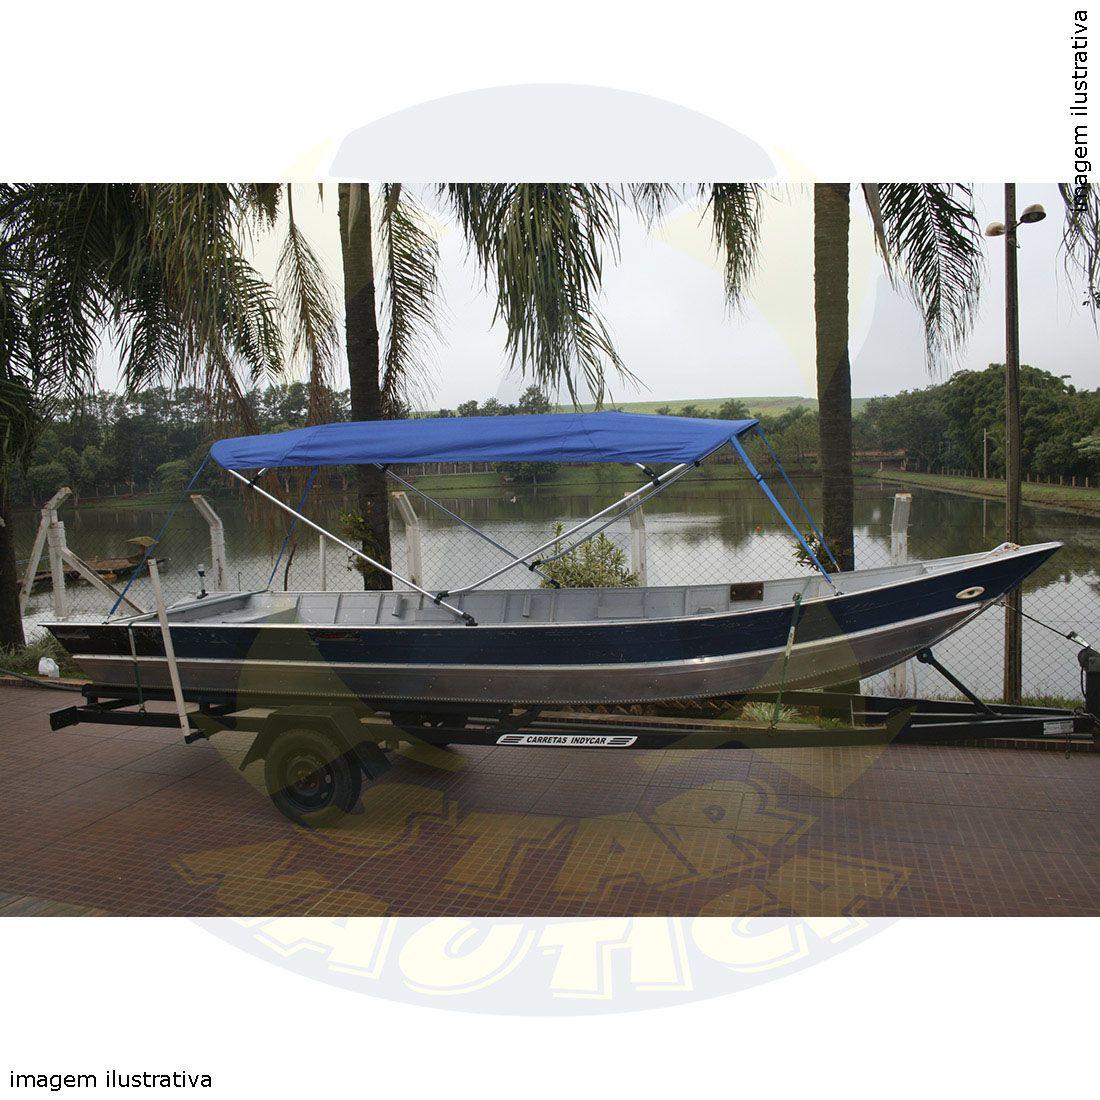 Capota Toldo Barco Calaça 600 Poliéster 4 Arcos Tubo 1 1/4